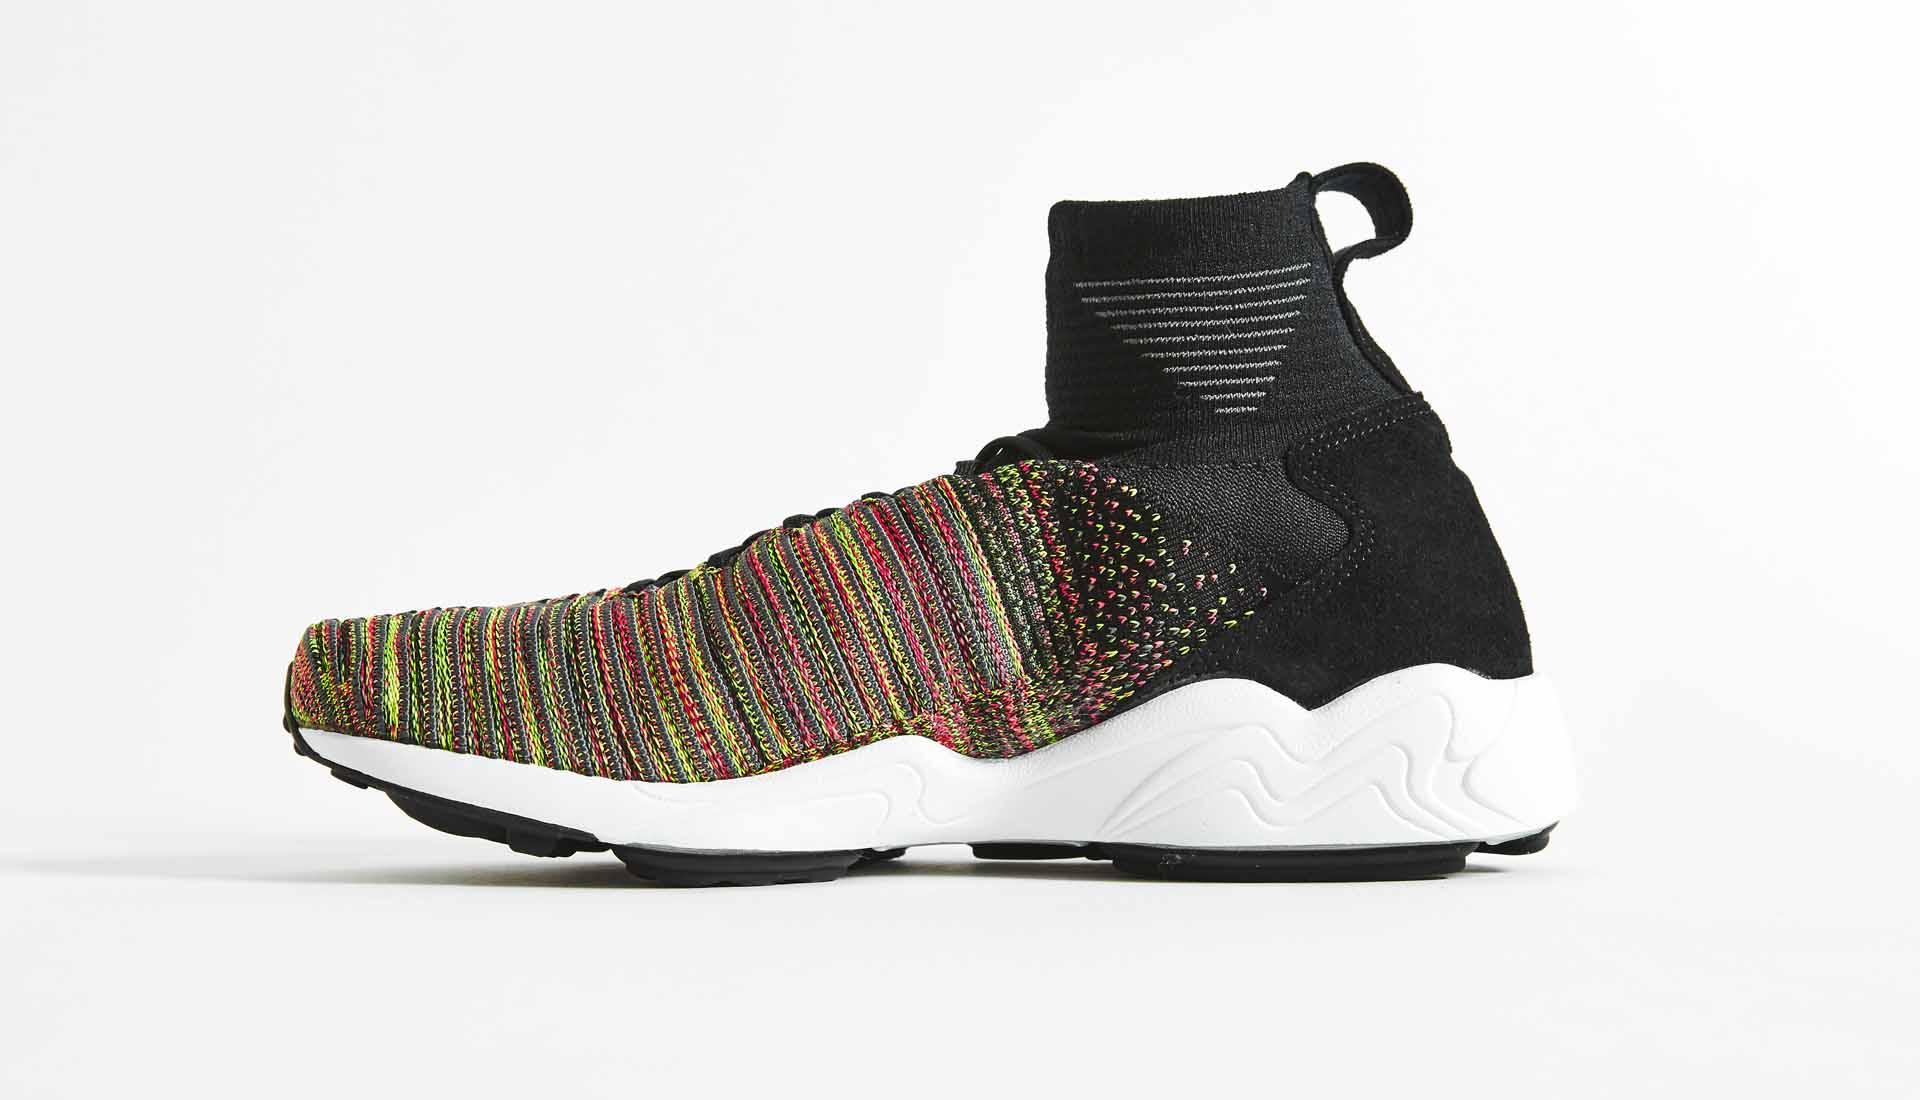 Turf Empire Nike Mercurial Flyknit Zoom Black Muti .jpg